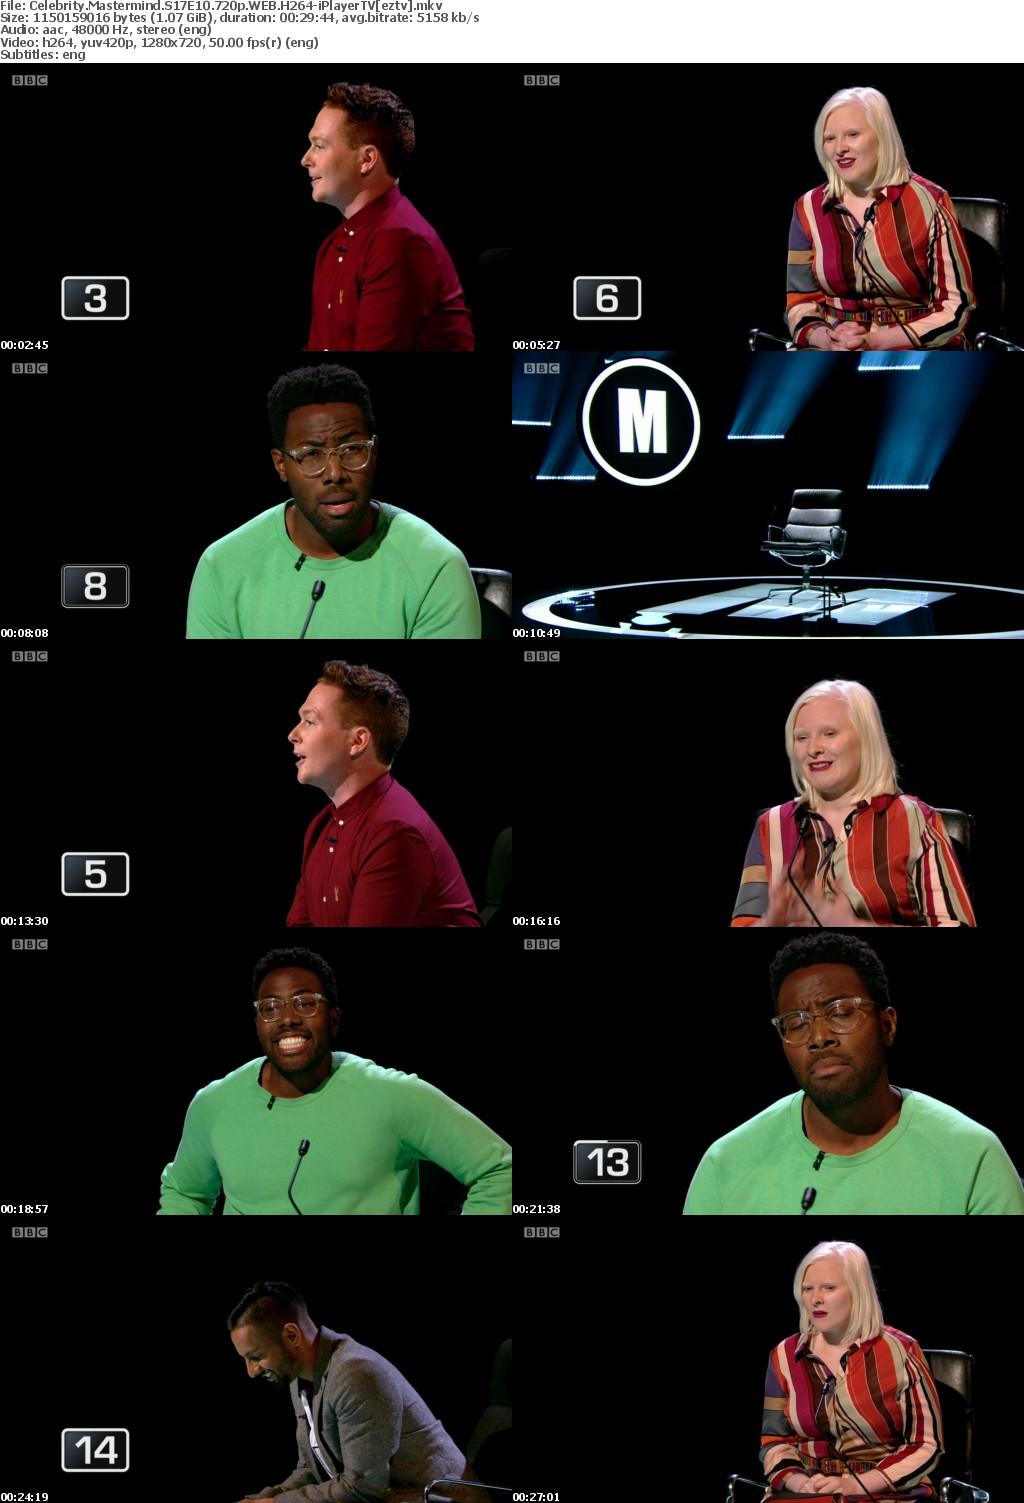 Celebrity Mastermind S17E10 720p WEB H264-iPlayerTV